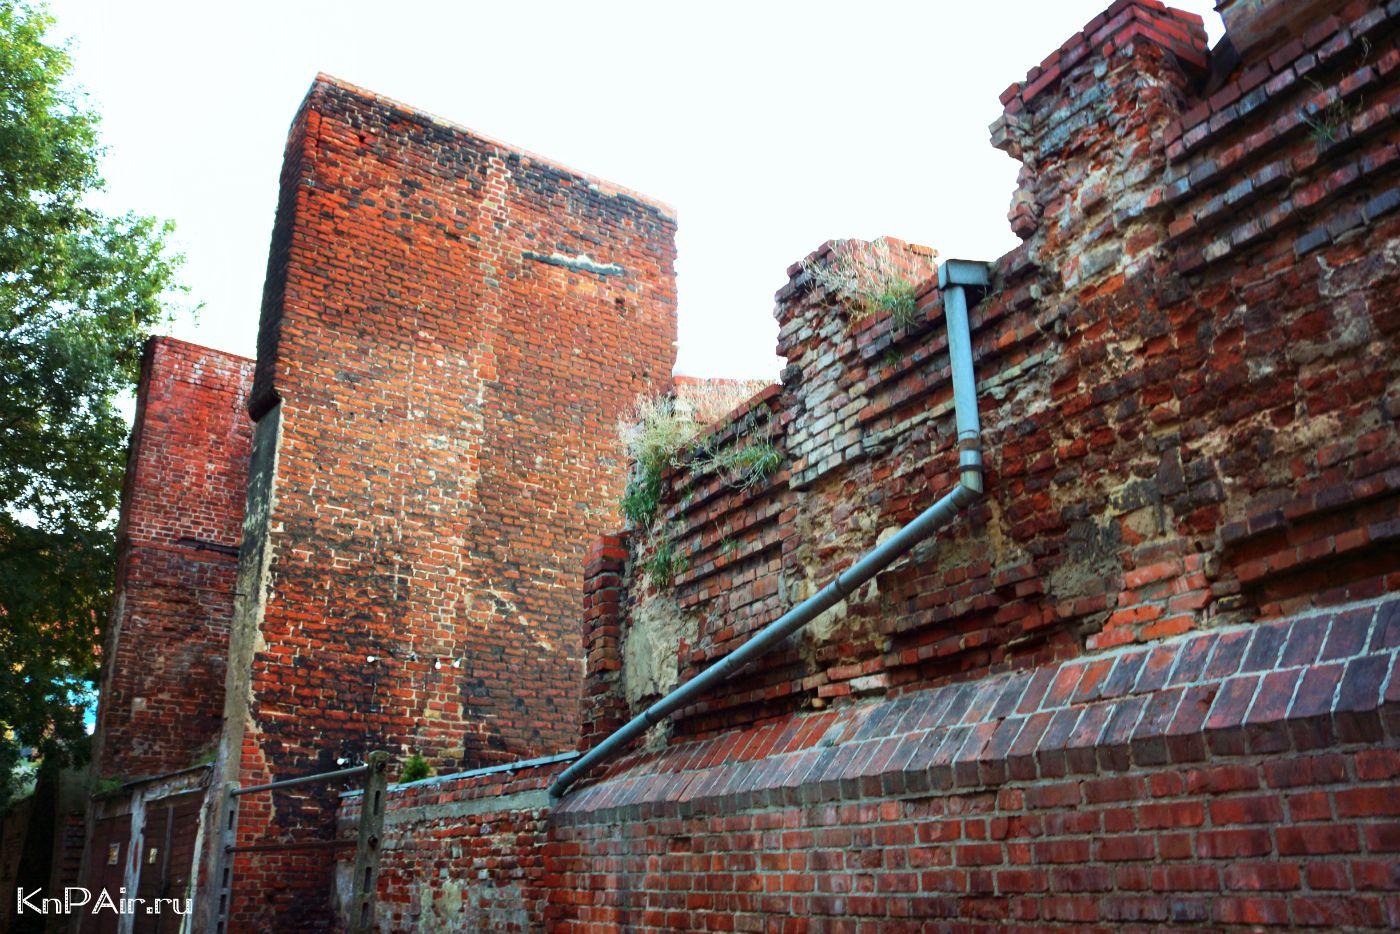 Ruiny-v-Gdanske